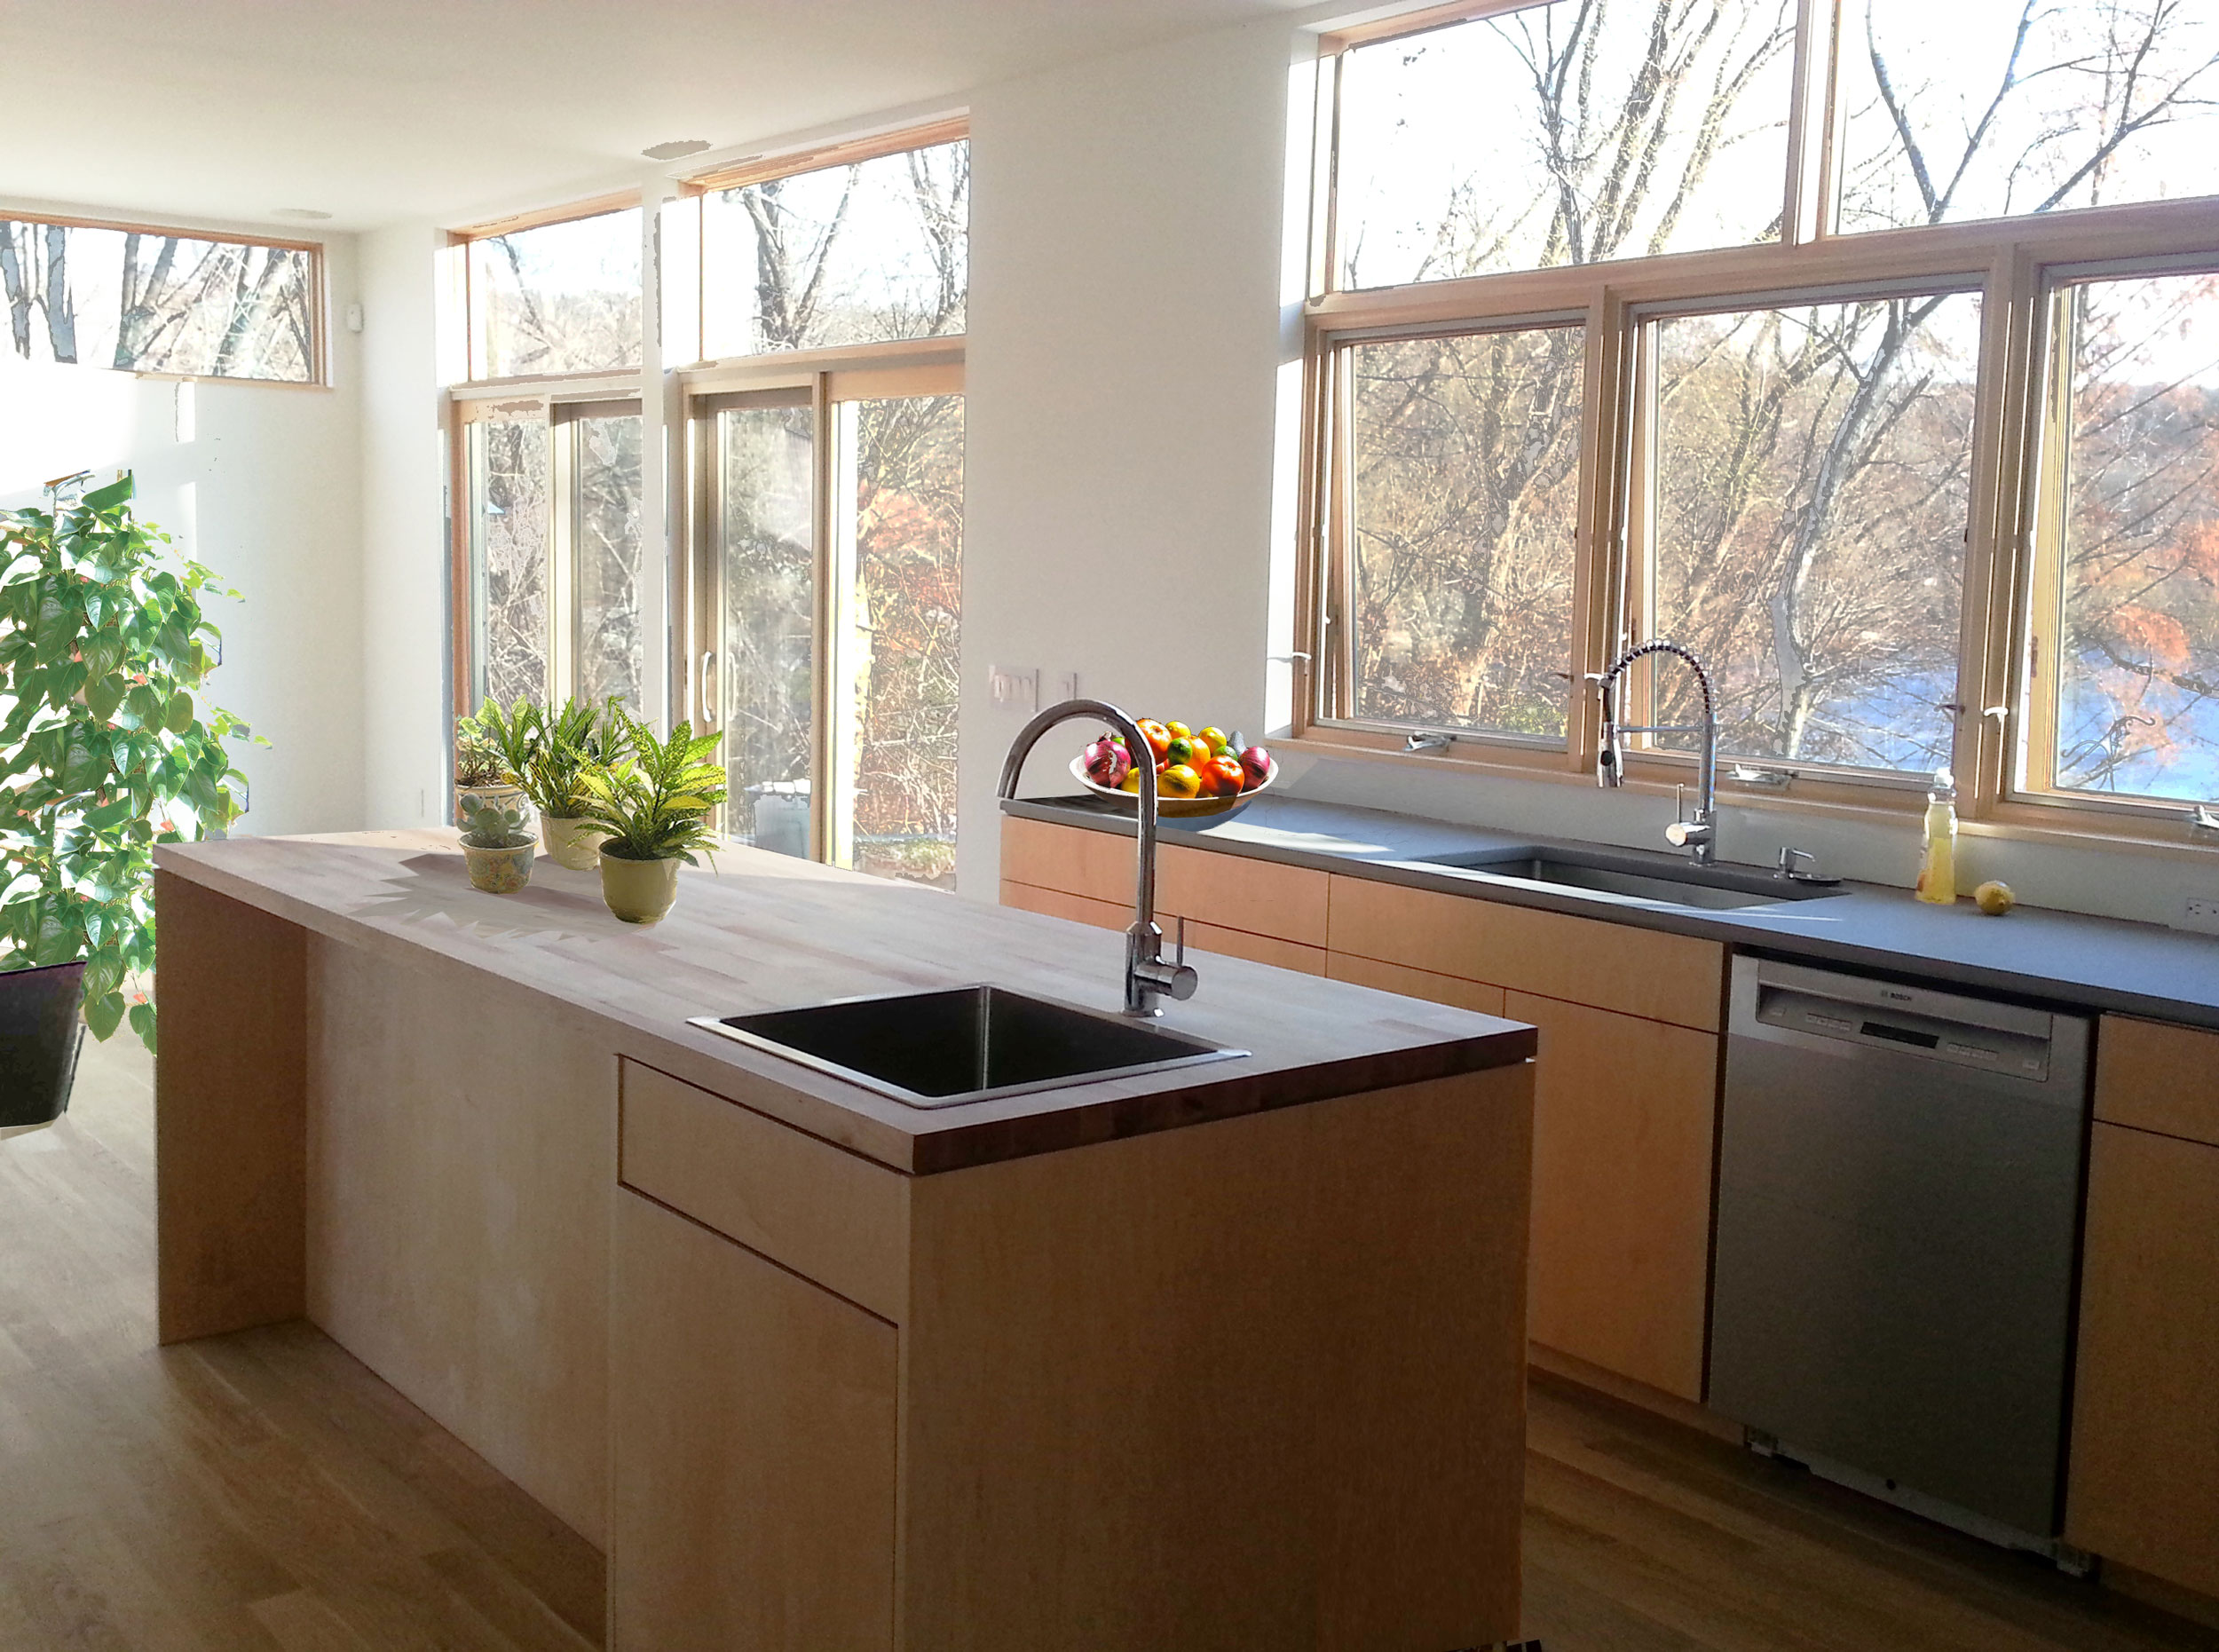 Ridgefield-lake-house-Int-View-4.jpg